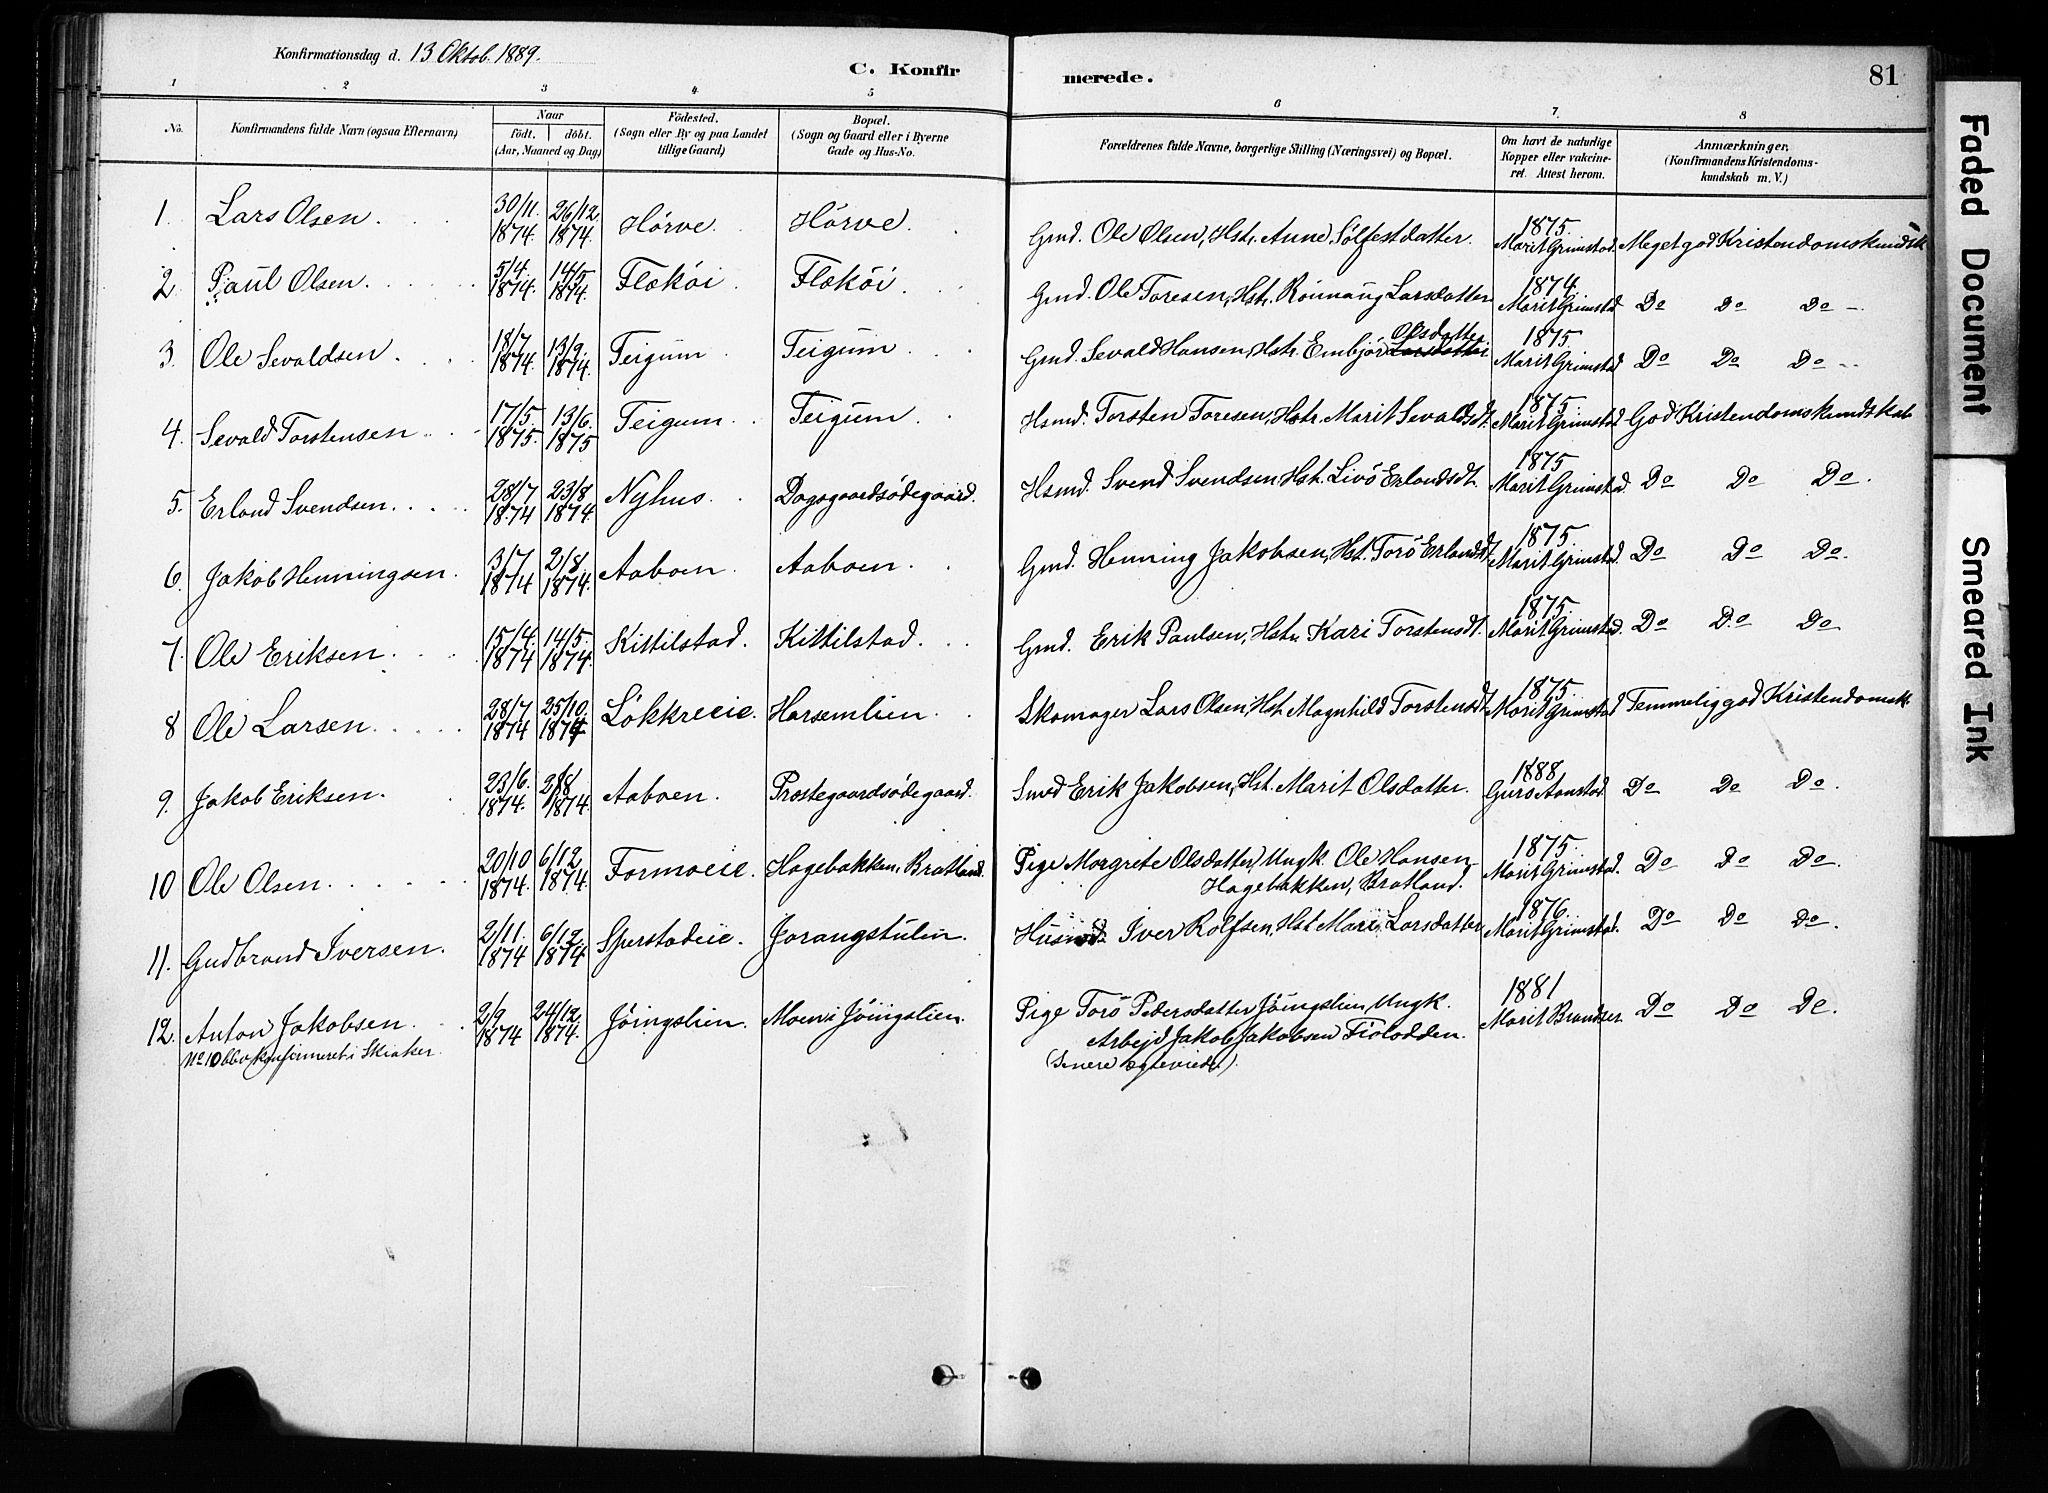 SAH, Skjåk prestekontor, Ministerialbok nr. 4, 1880-1904, s. 81